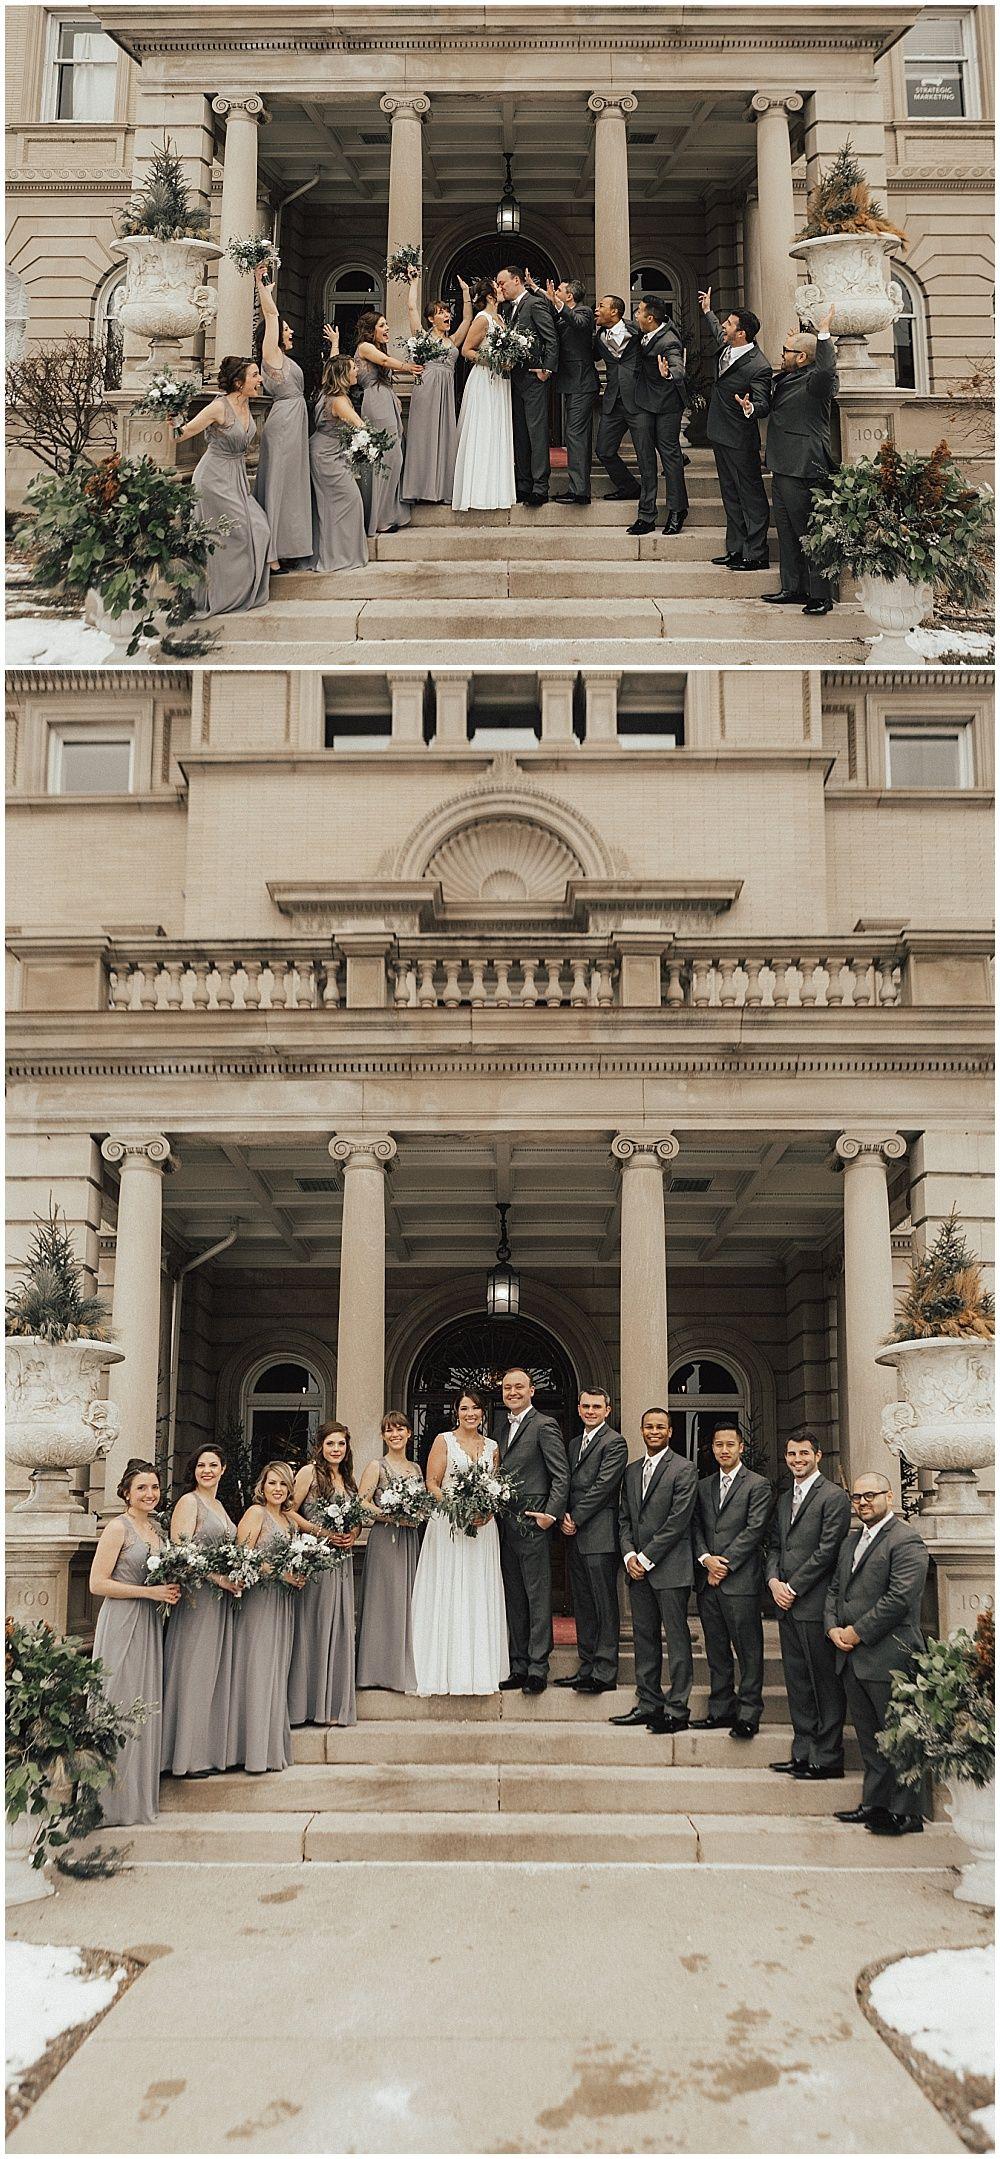 Wedding floral at Semple Mansion winter wedding designed by Minneapolis wedding florist Artemisia Studios. Photos by Kiana Grant Photography (http://kianagrantphotography.com/). #flowers #floral #weddingfloral #weddingparty #semplemansion #artemisiastudios #minneapolisweddingflorist